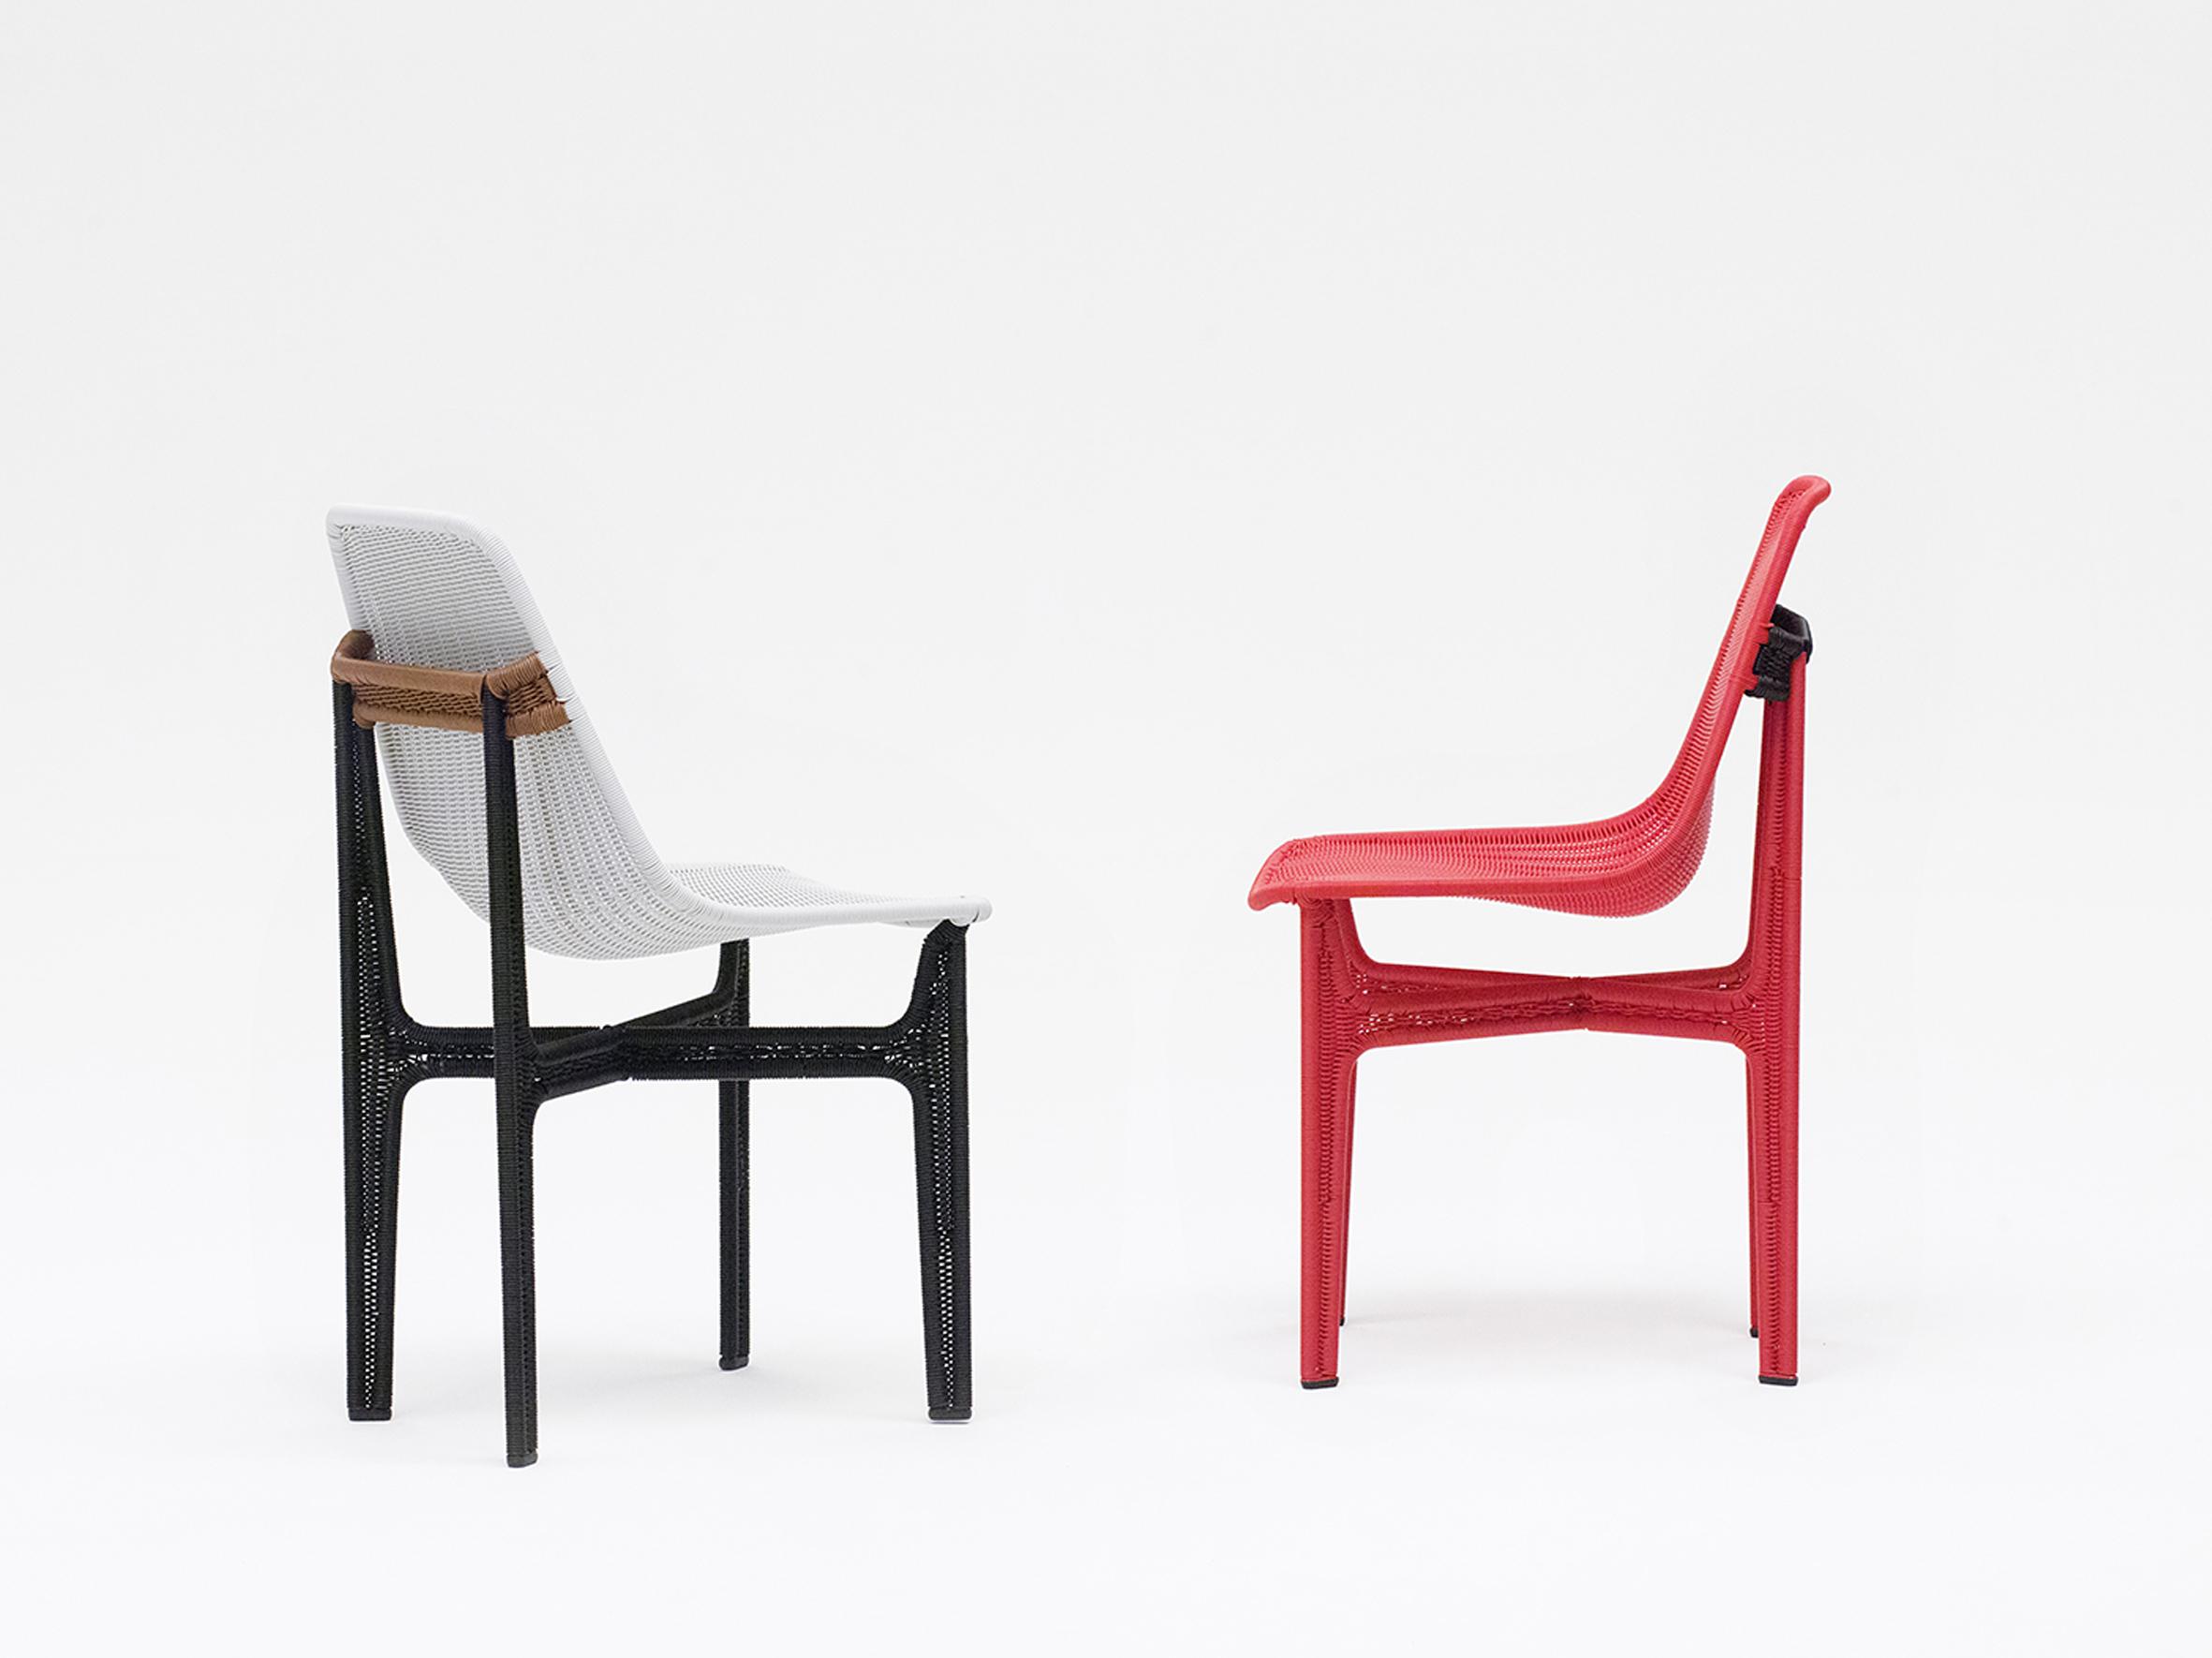 yamakawa chair furniture dining-chair synthetic rattan